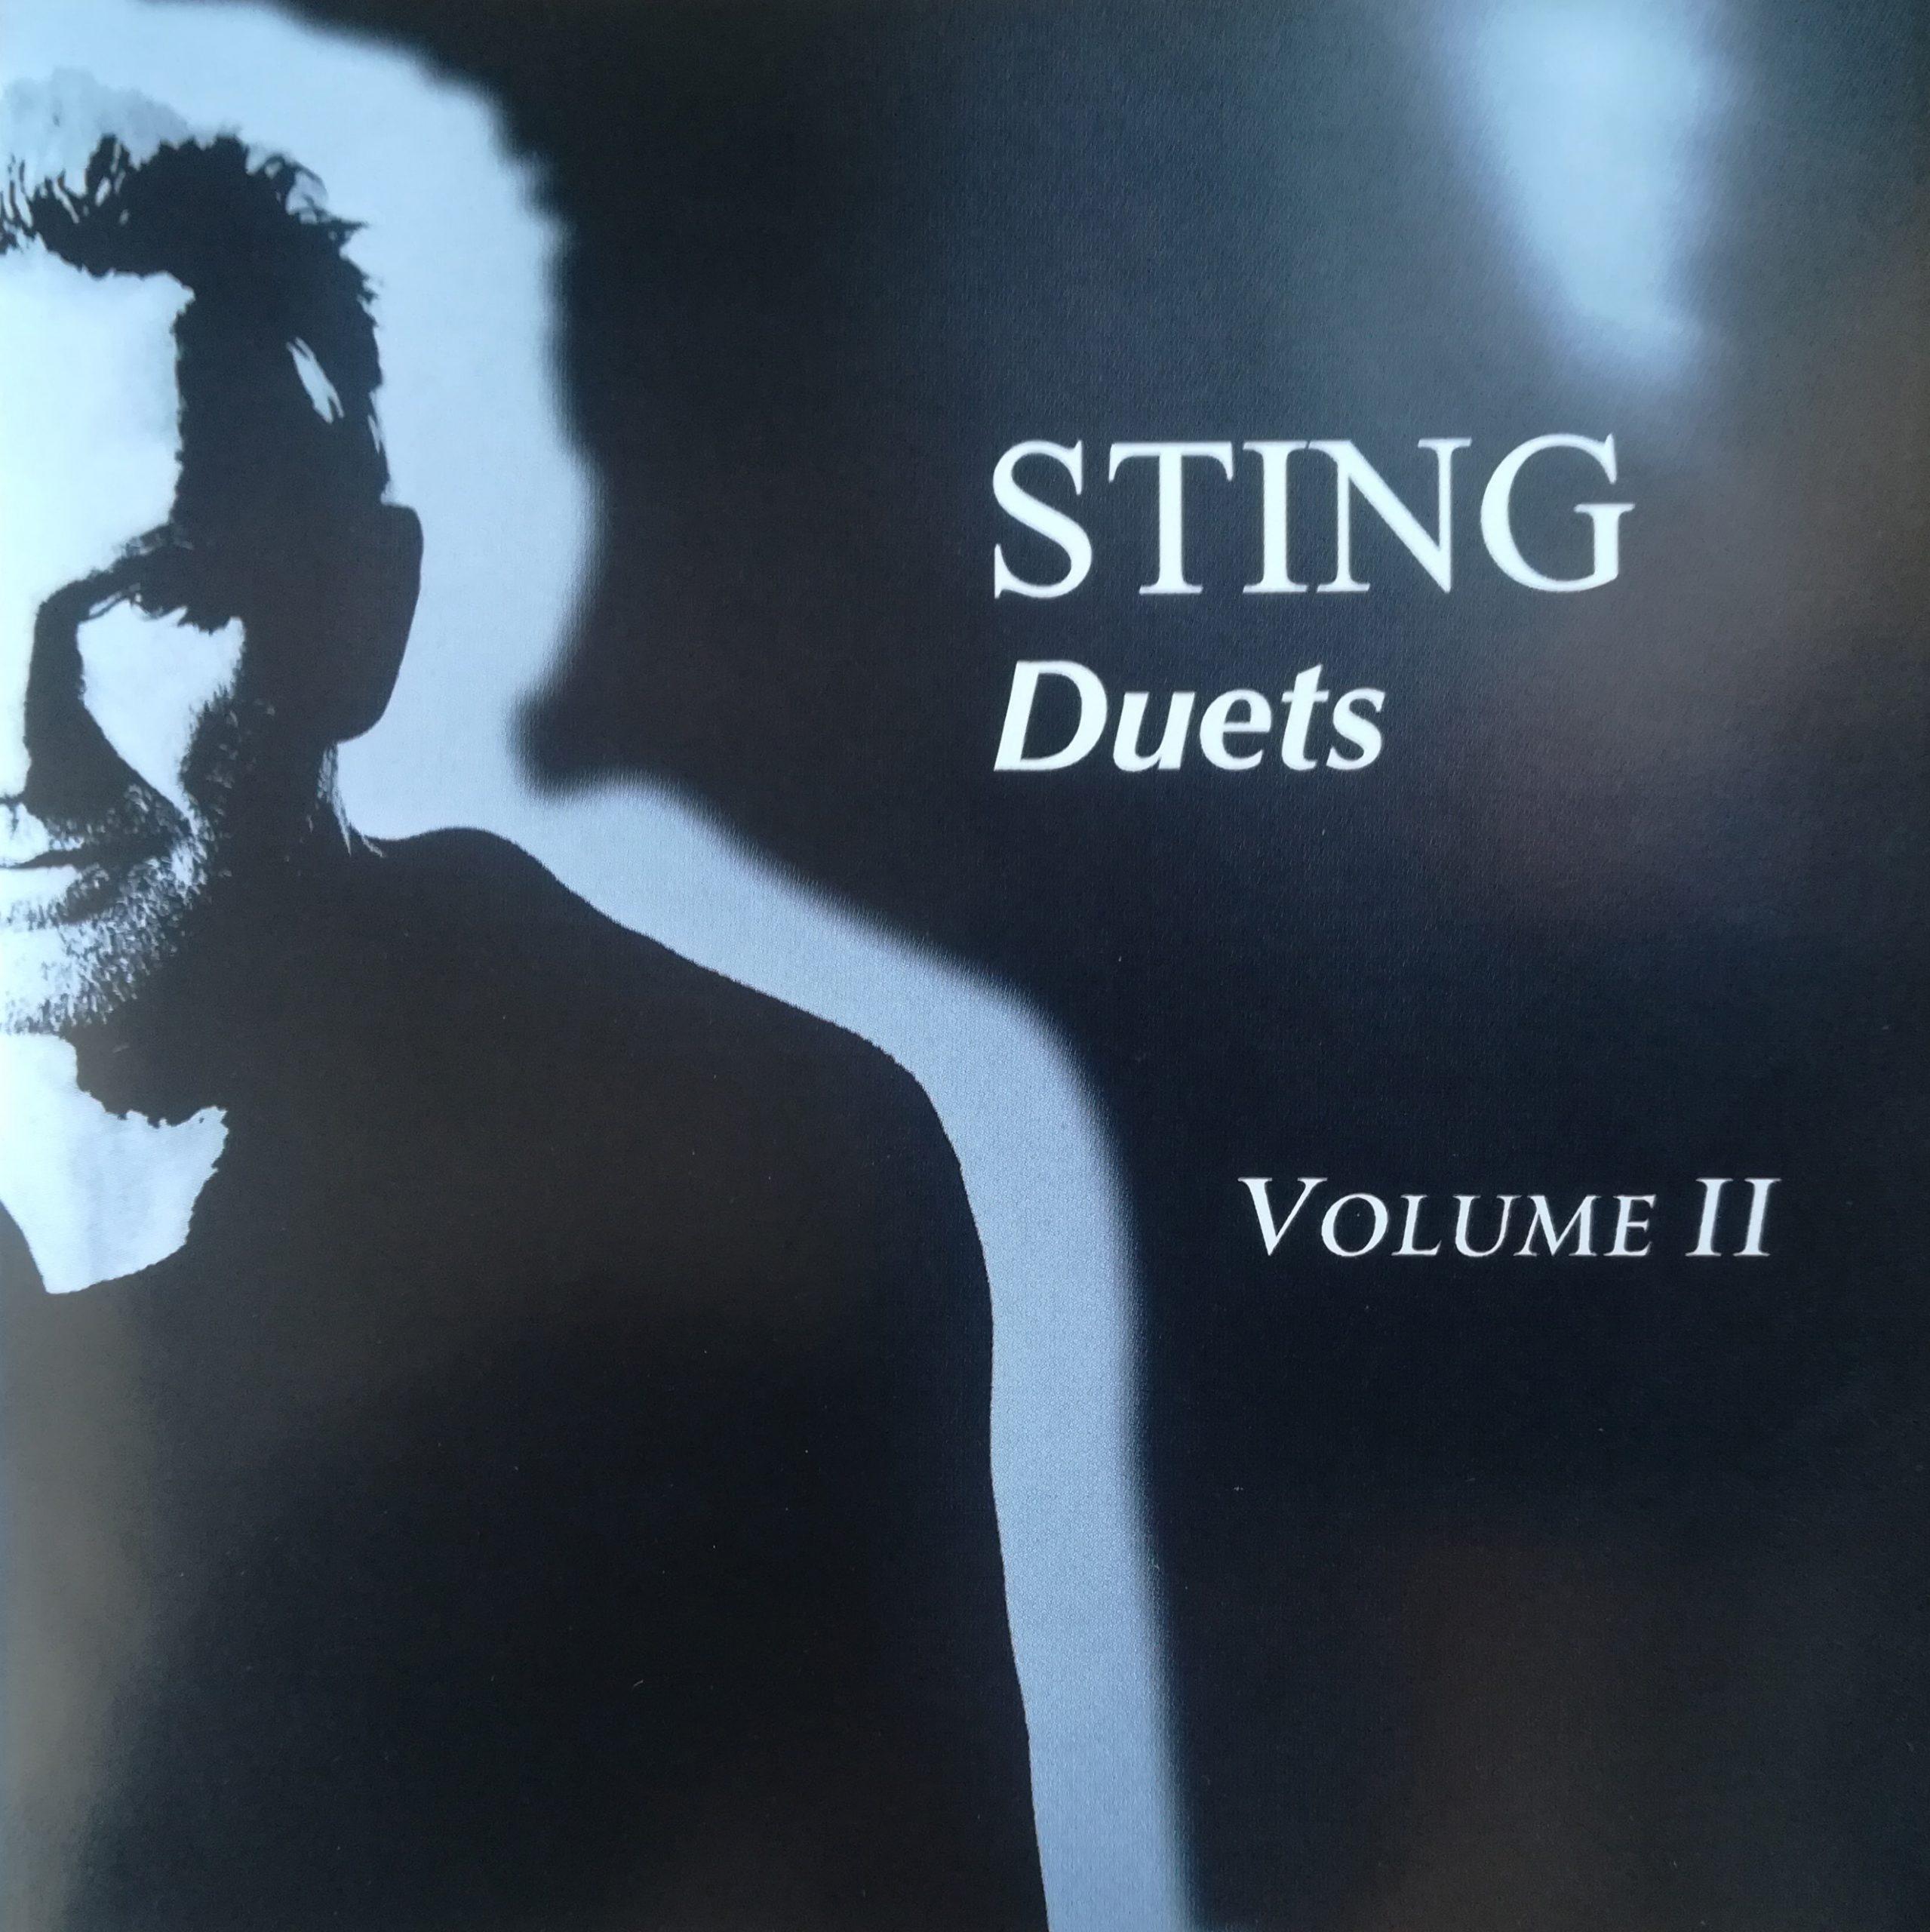 Sting - Duets. Volume II (2021)